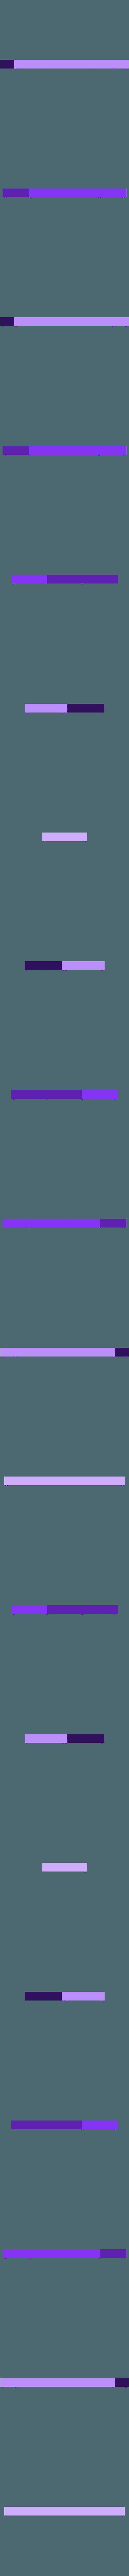 28mm_mini_case_BRACKETINSETSTUDSnameplate.stl Download free STL file 28mm mini plinth remix; featuring name plates • Object to 3D print, daftpirate15